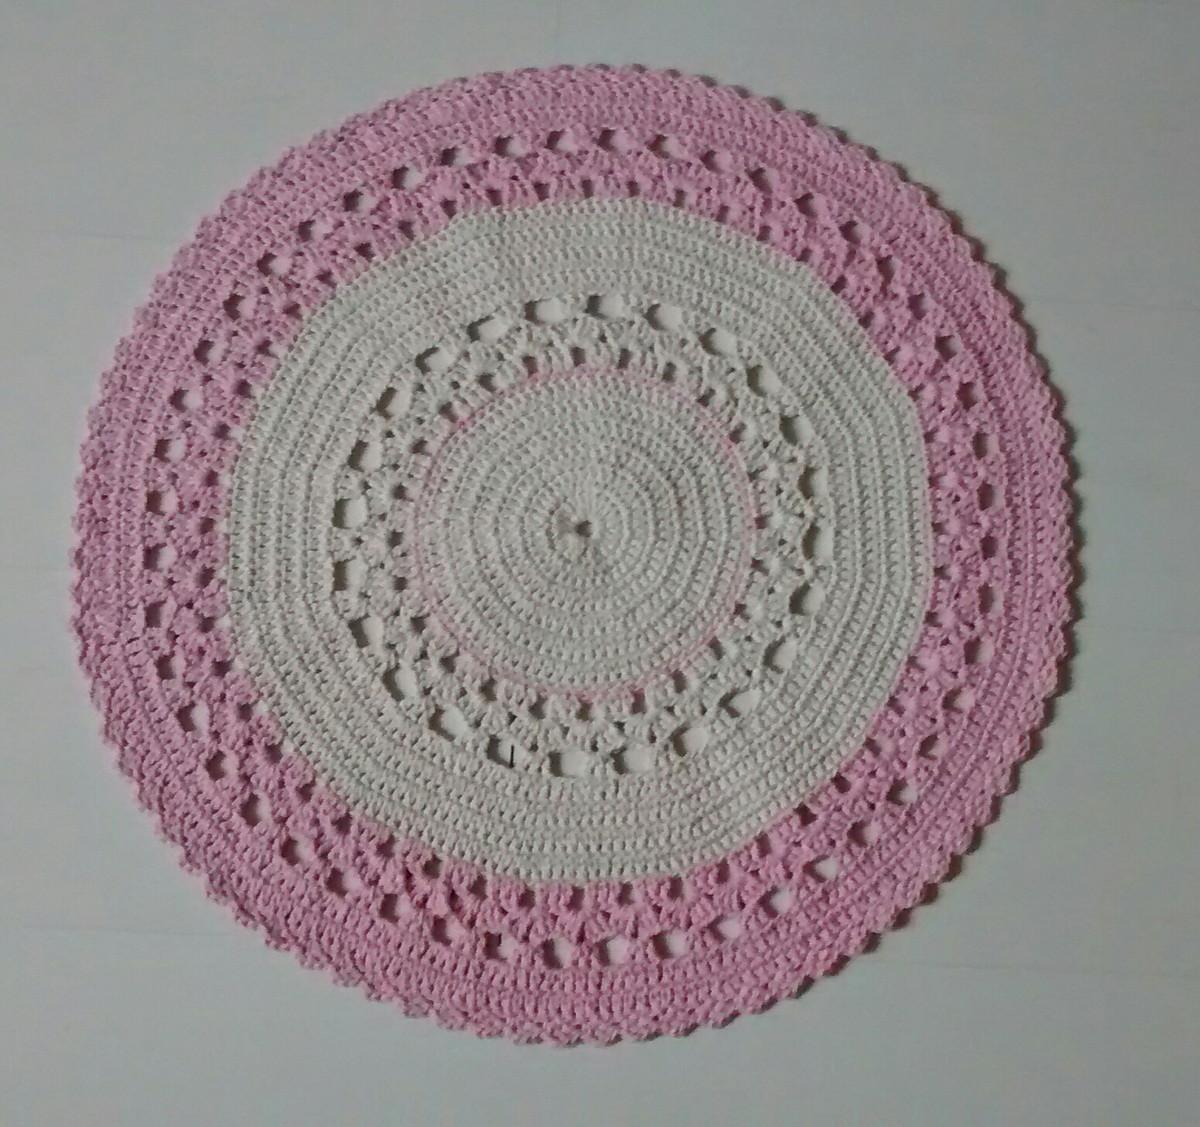 Tapete redondo cru e rosa criativo e caprichado elo7 for Rosa tapete